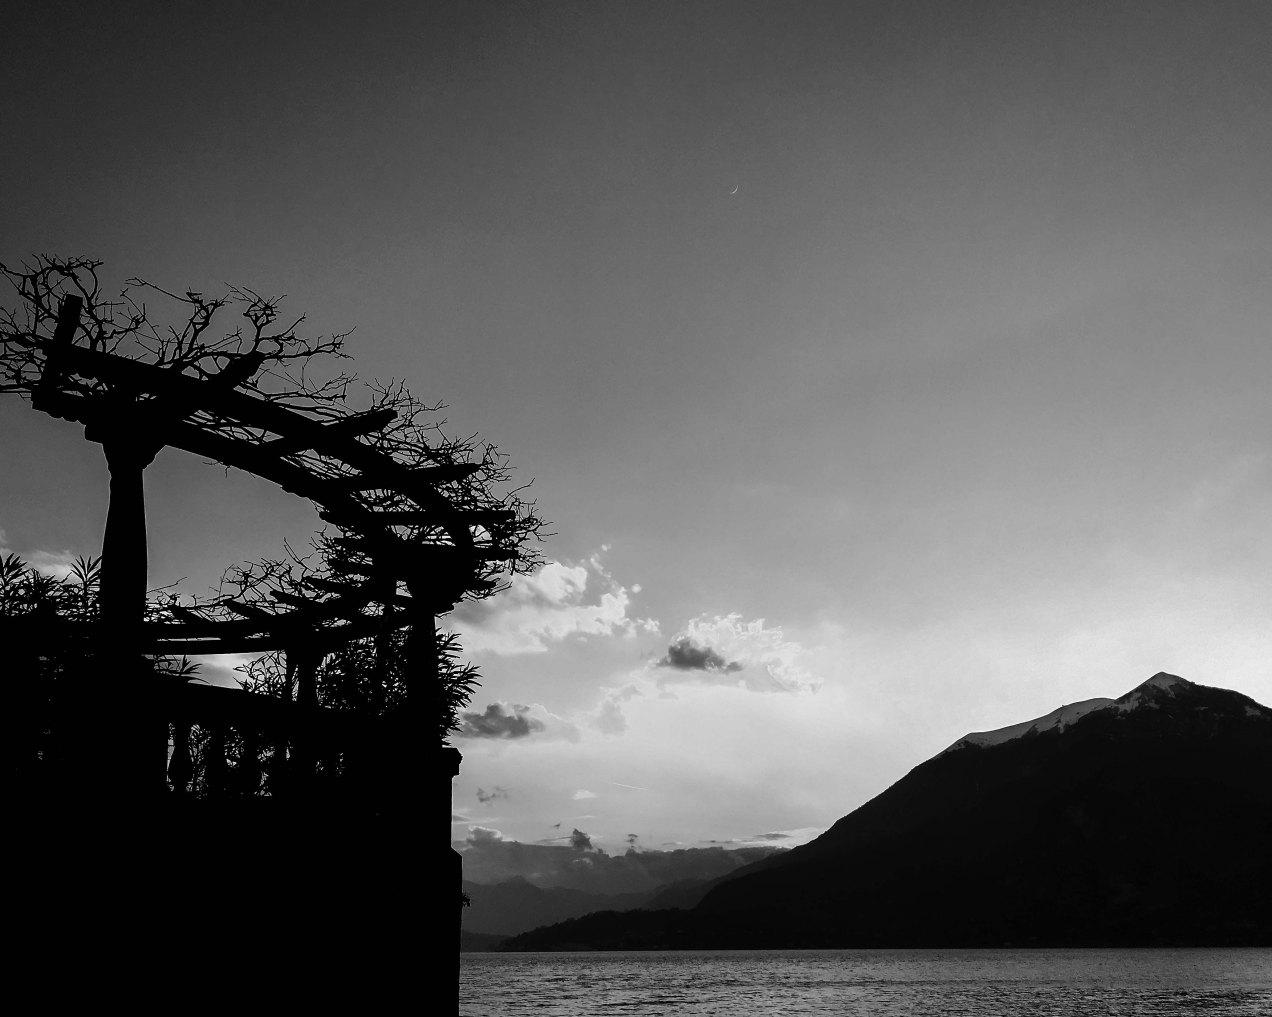 Balcon, lac de Côme, Varenna, Italie, gildalliere, 2018